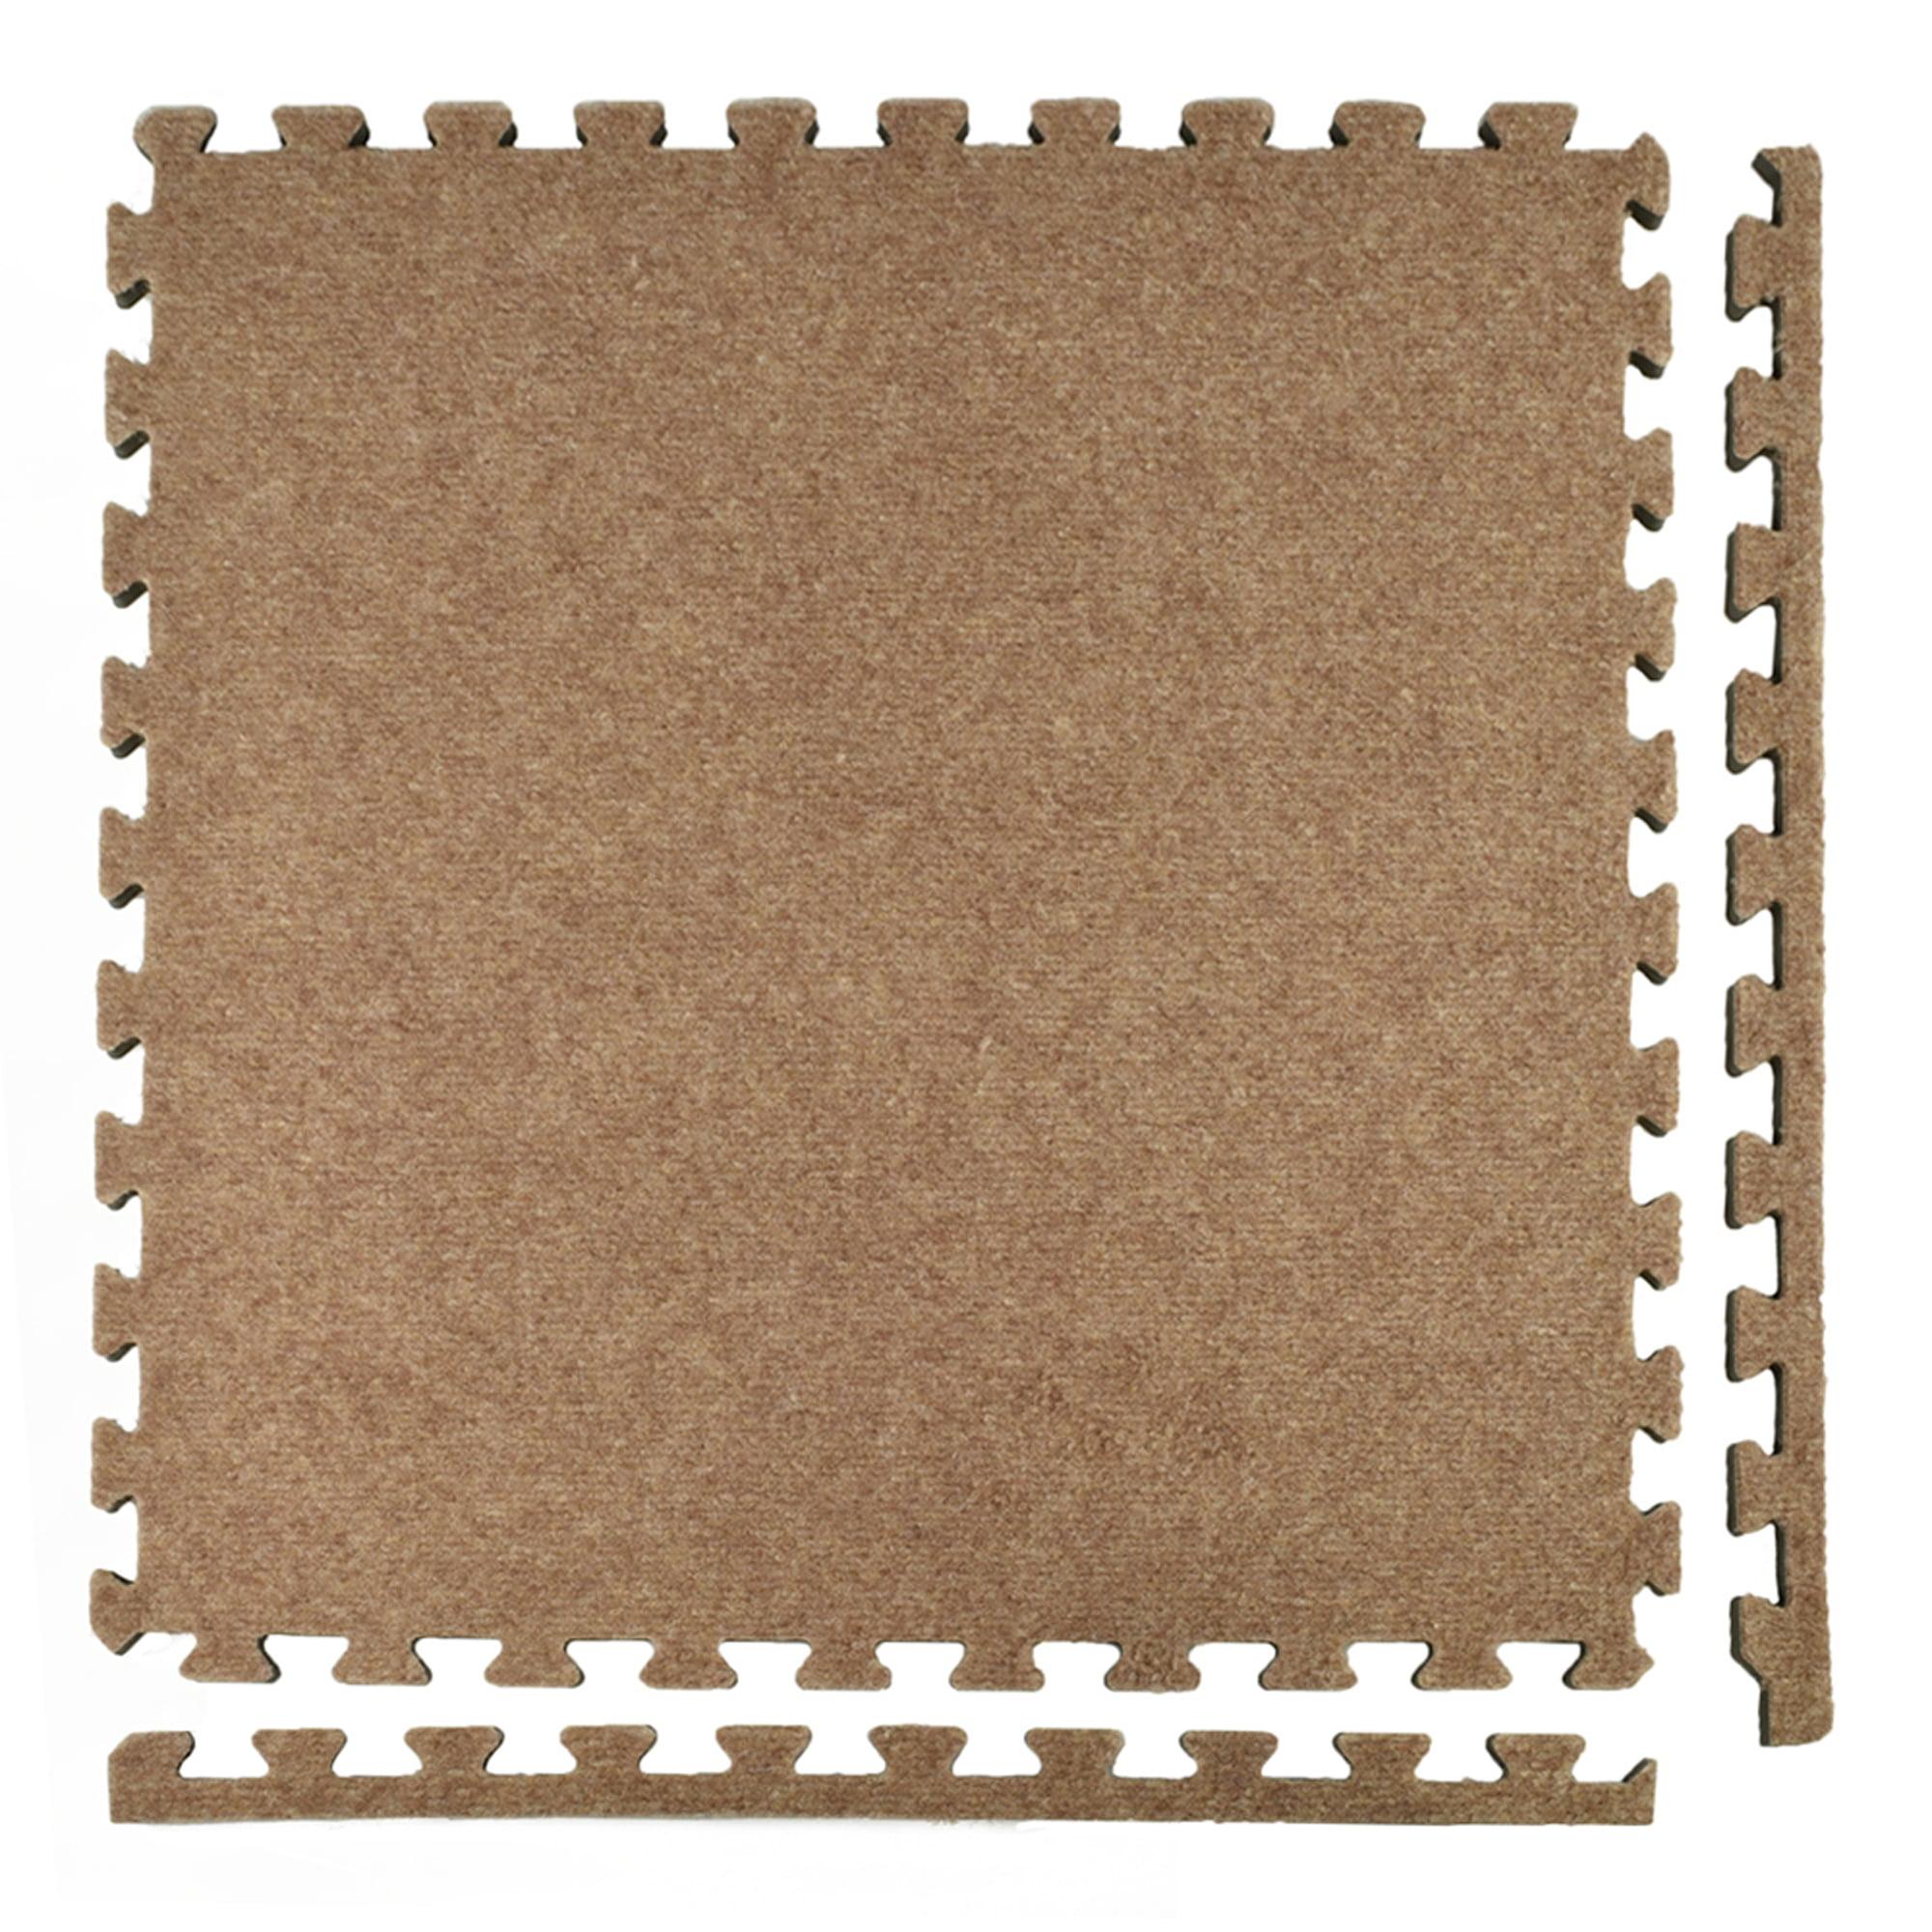 Greatmats Royal Interlocking 2 ft. x 2 ft. x 5/8 in. Carpet Floor Tiles Blue 25 Pack